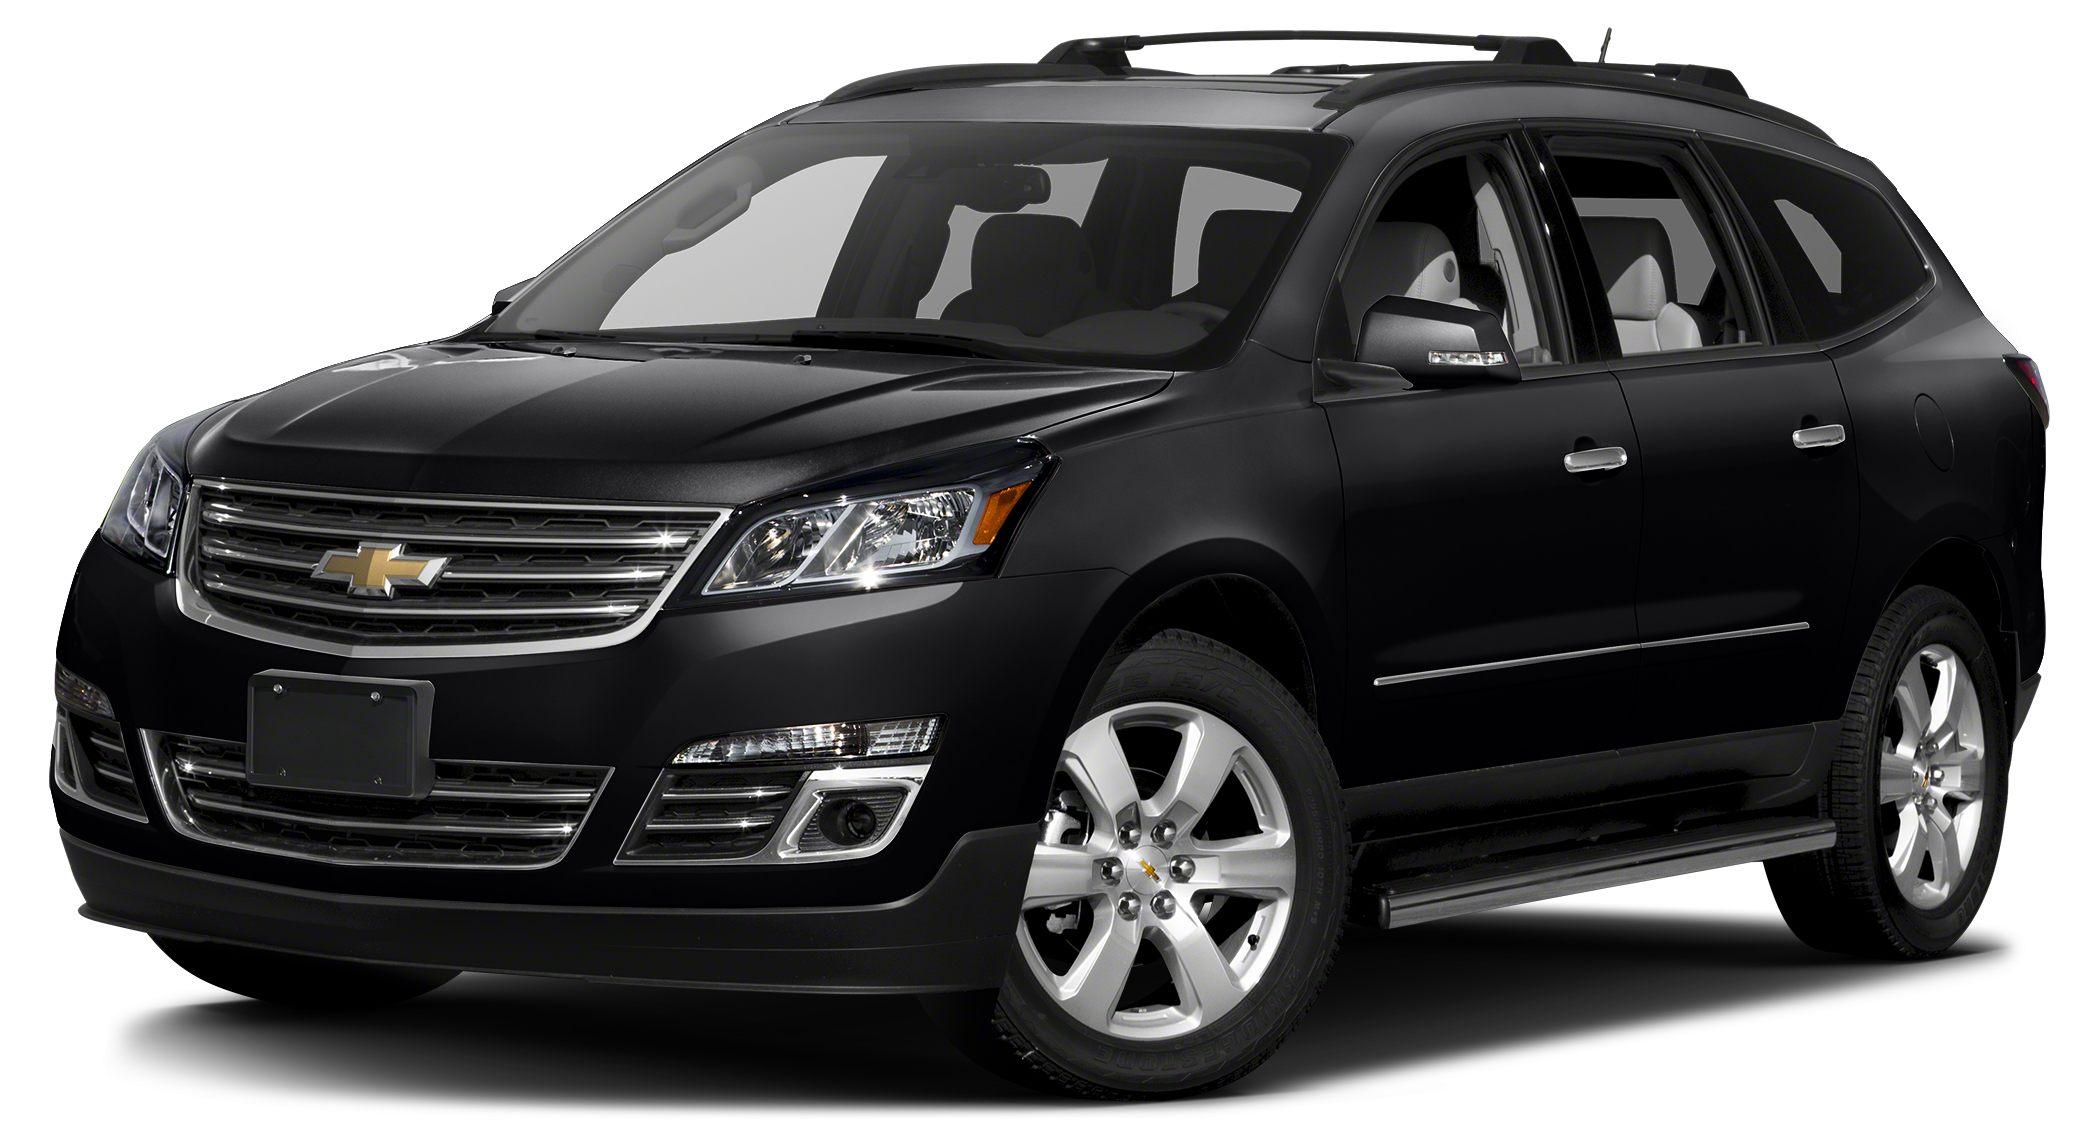 2017 Chevrolet Traverse Premier Miles 5Color Black Stock T7045 VIN 1GNKRJKD1HJ124859